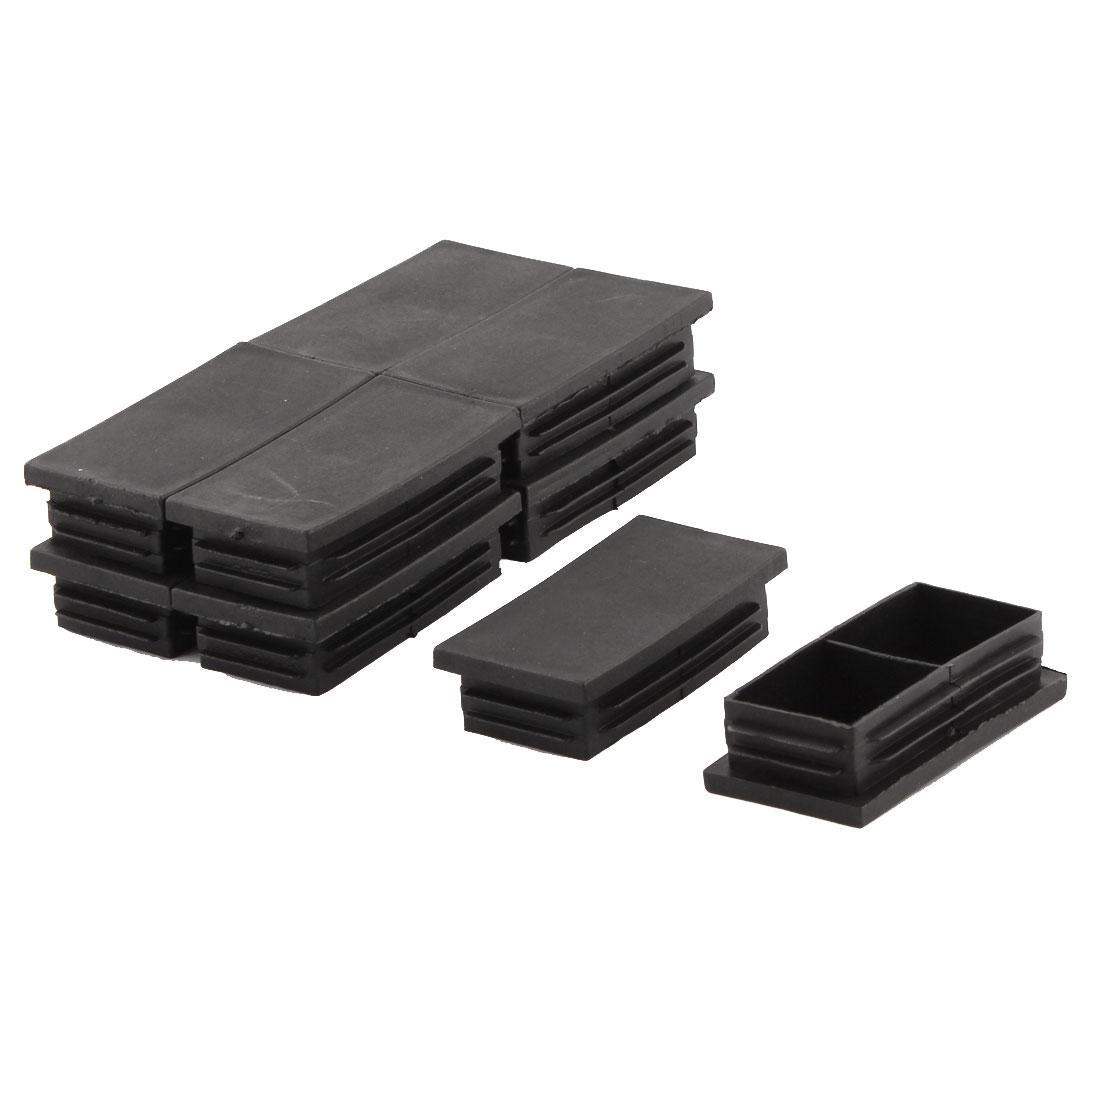 Furniture Feet Rectangle Tubing Pipe Plugs Tube Inserts Caps Covers 10 PCS